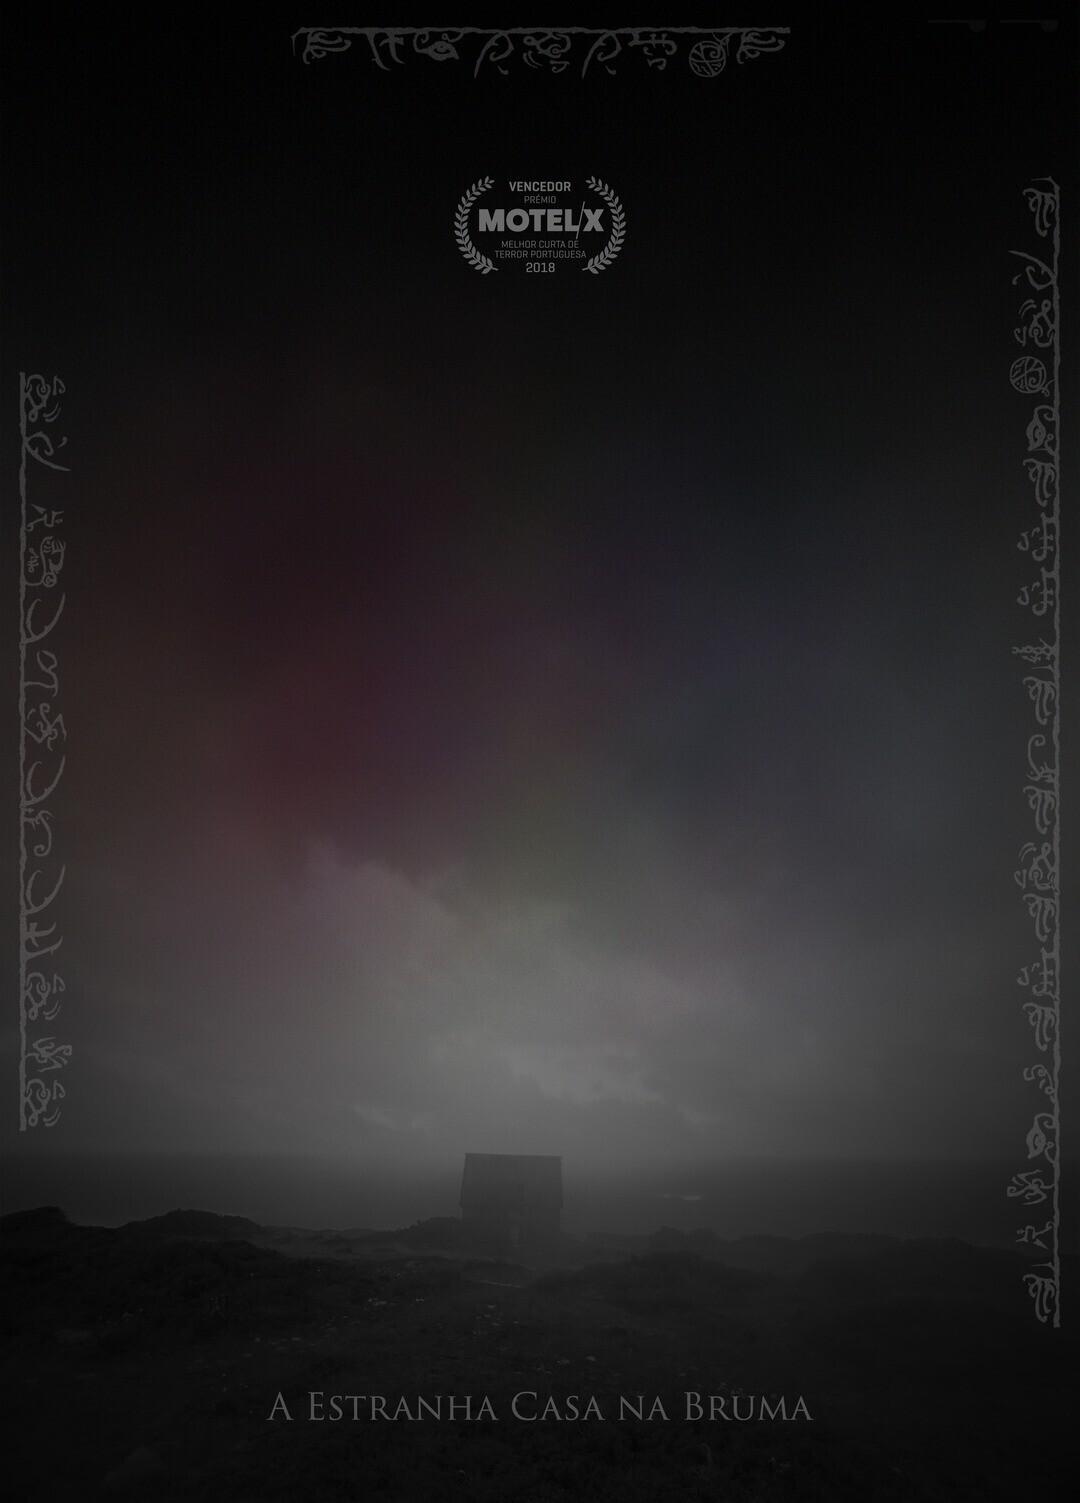 AECB poster